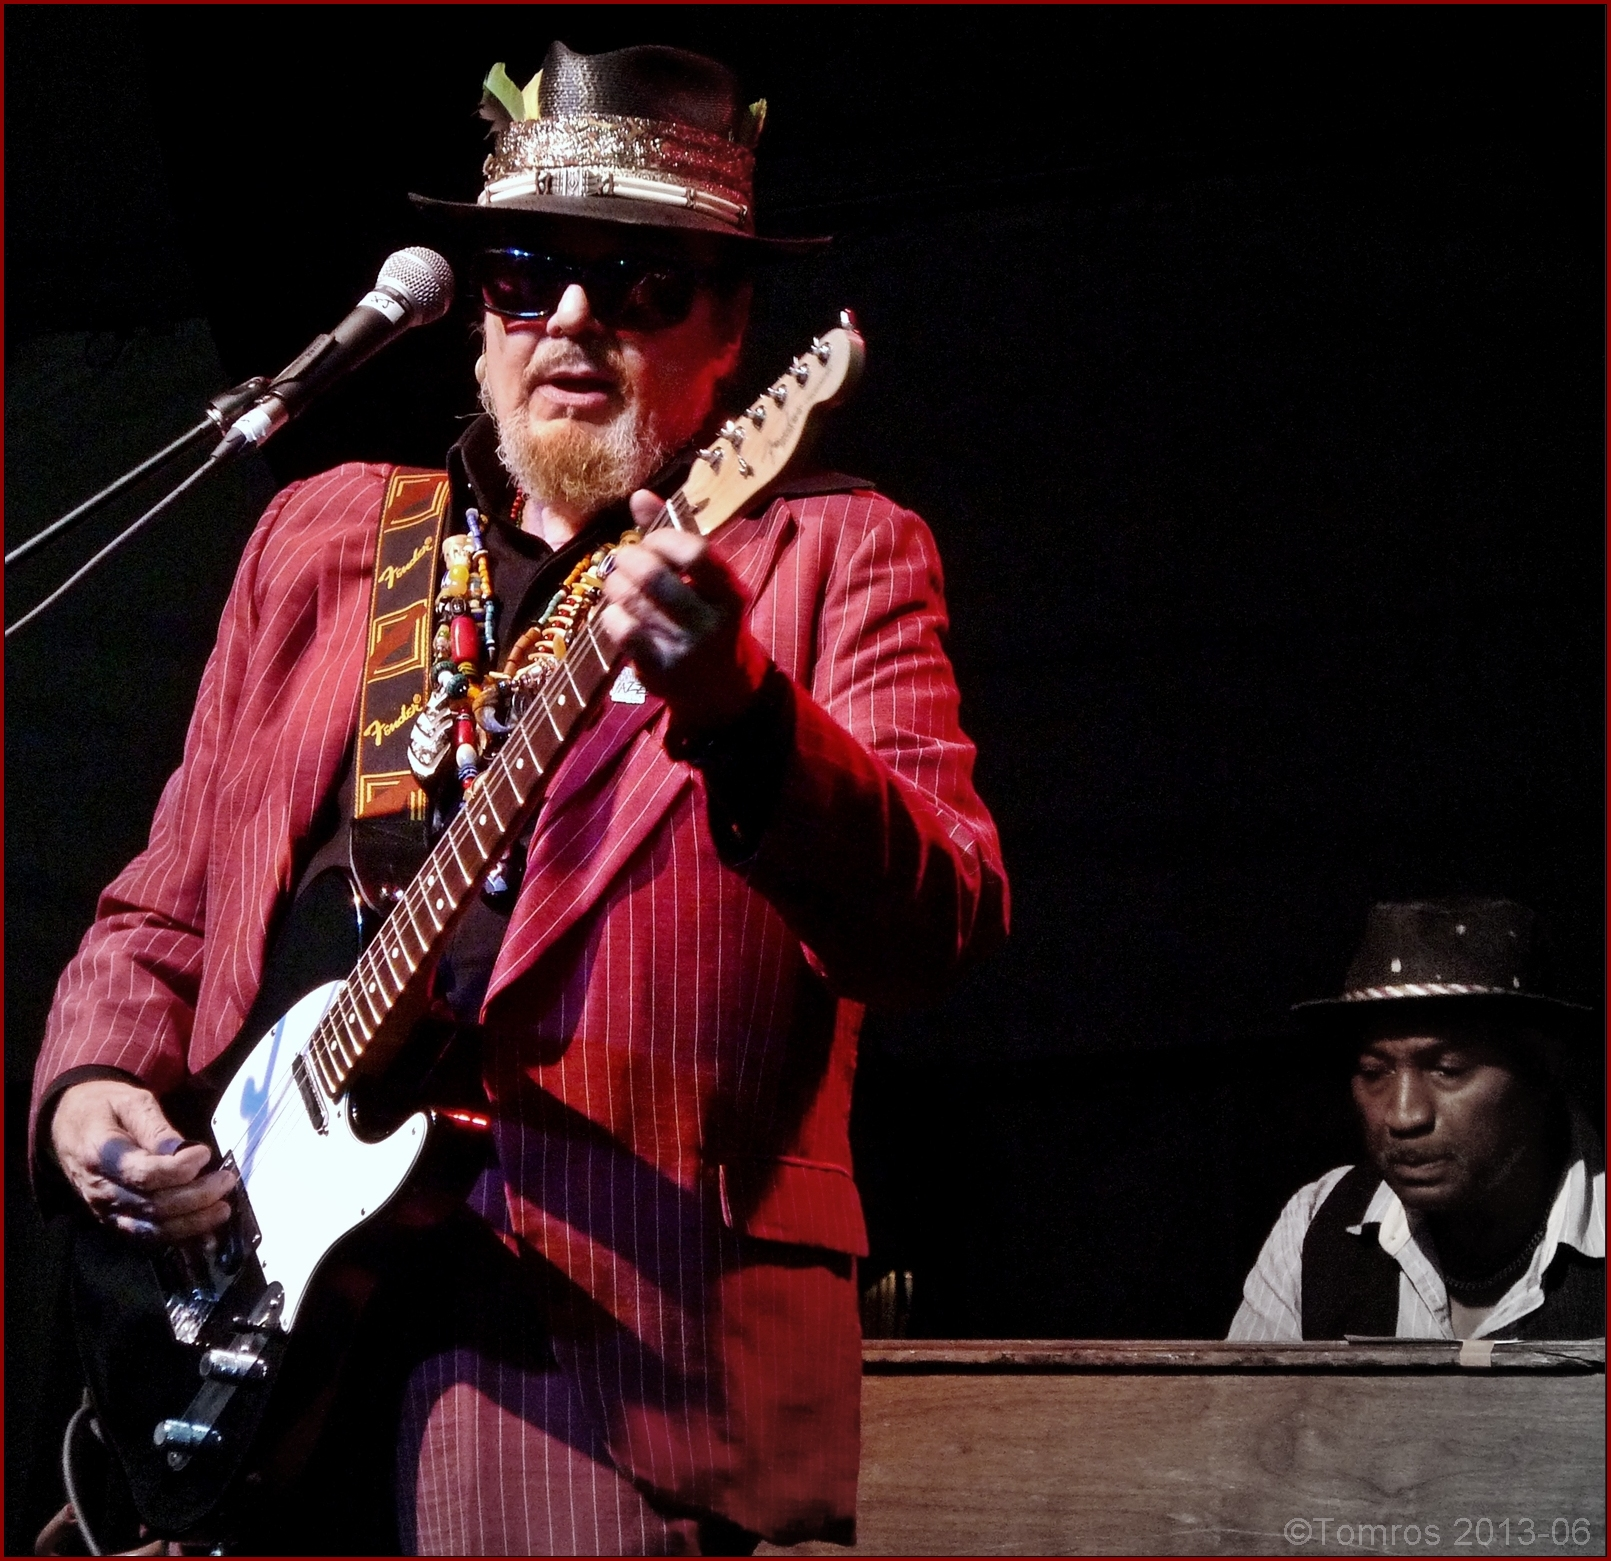 Dr. john at main stage, toronto jazz festival, june 2013